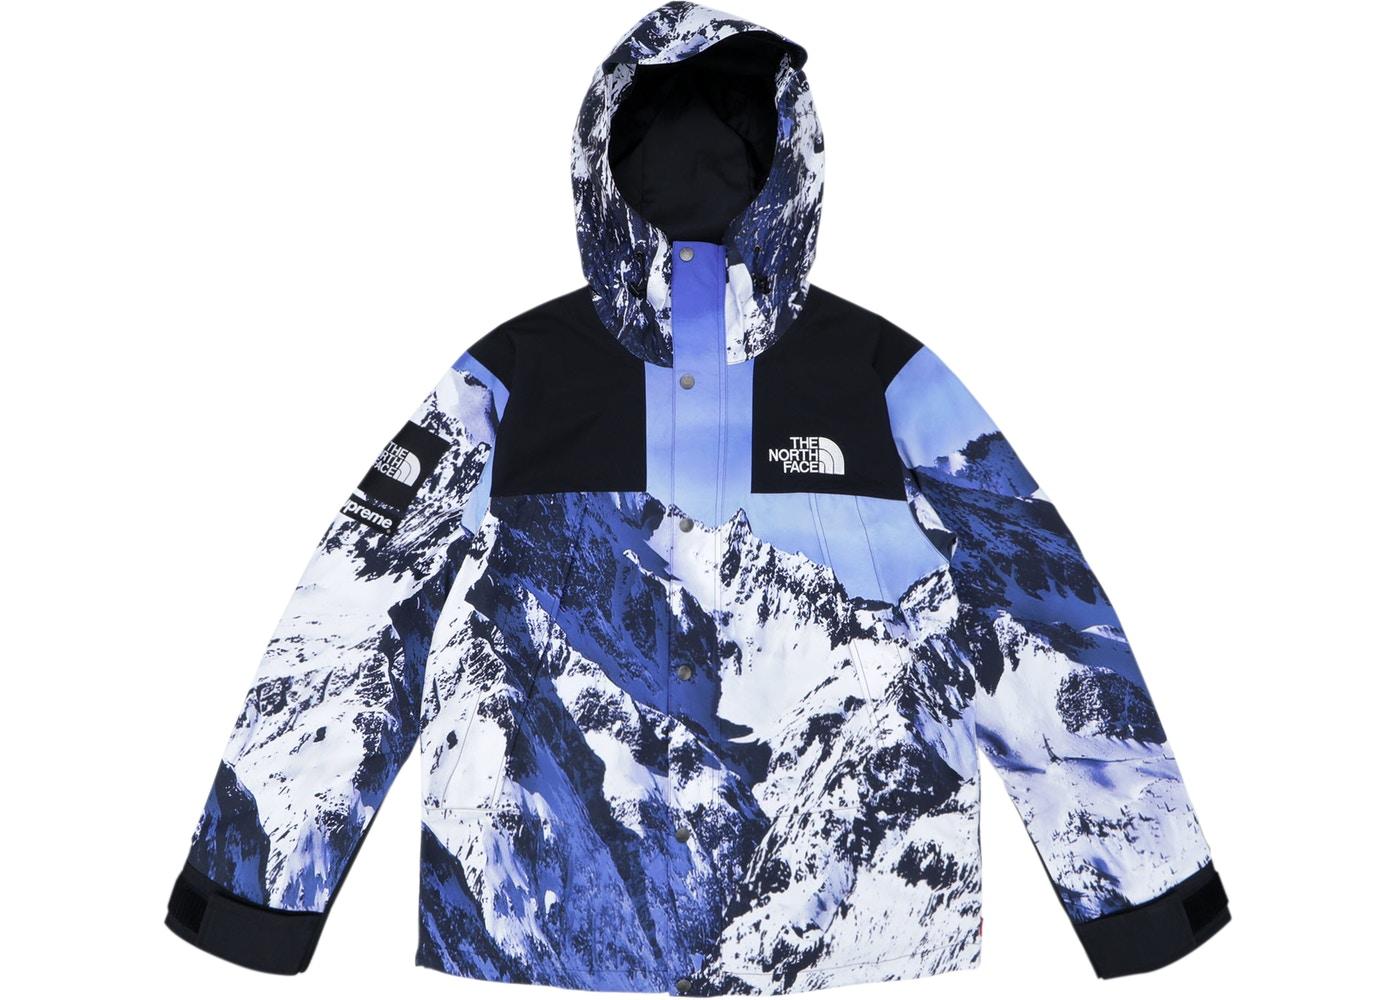 c5532f616 2017 fw tnf snow mountain parka windbreaker jacket blue white black box  logo bogo size m